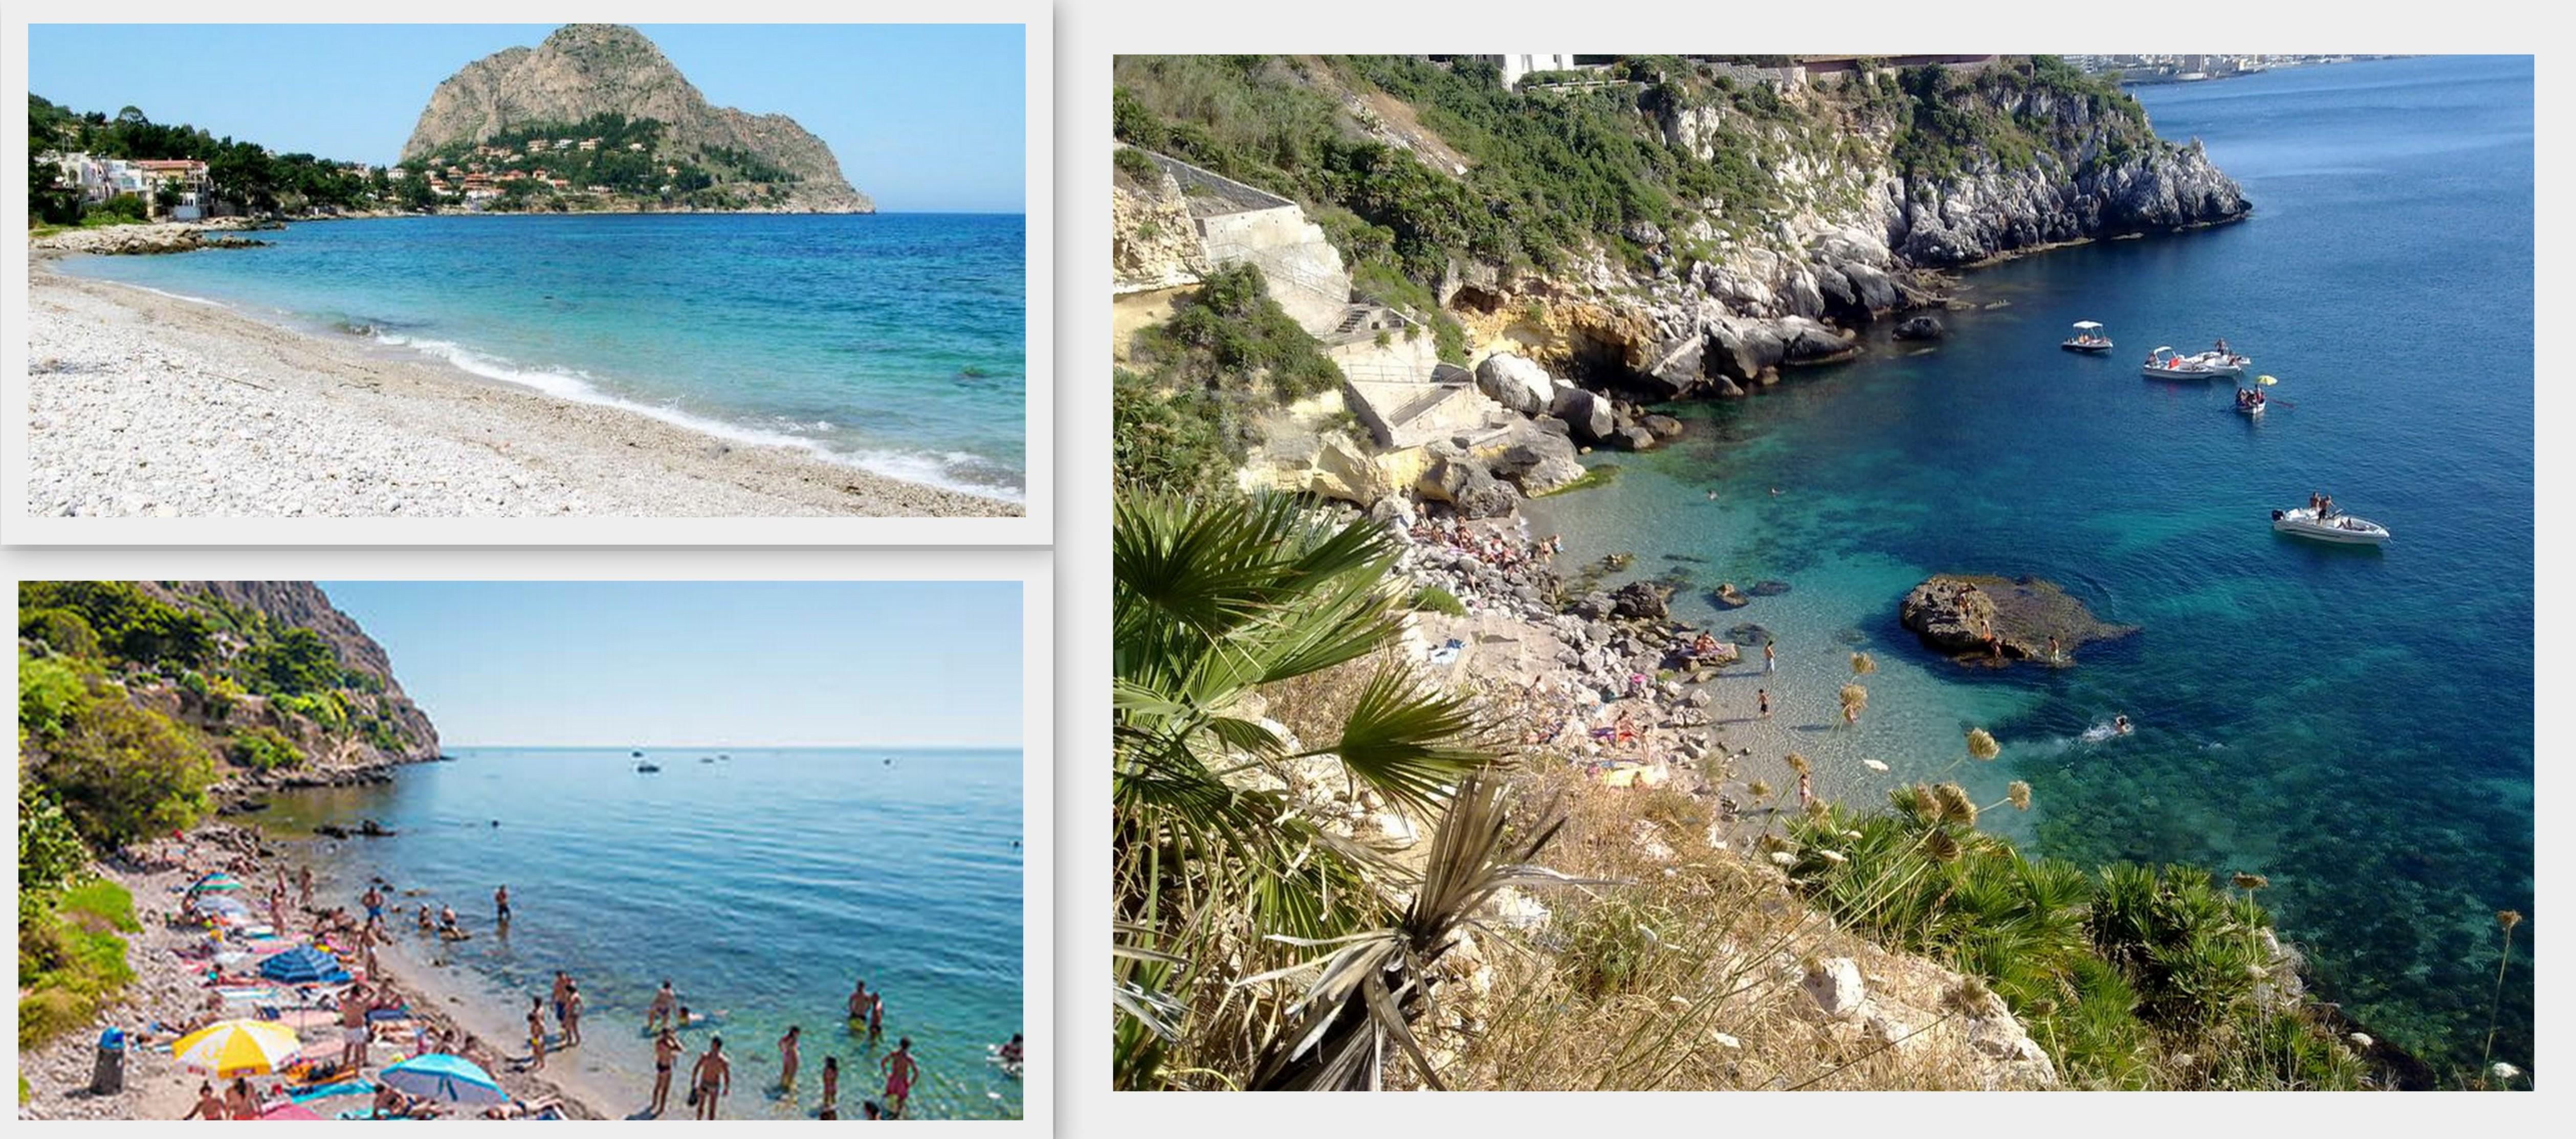 10 cose da non perdere a Bagheria e dintorni - Gluten Free Travel and Living